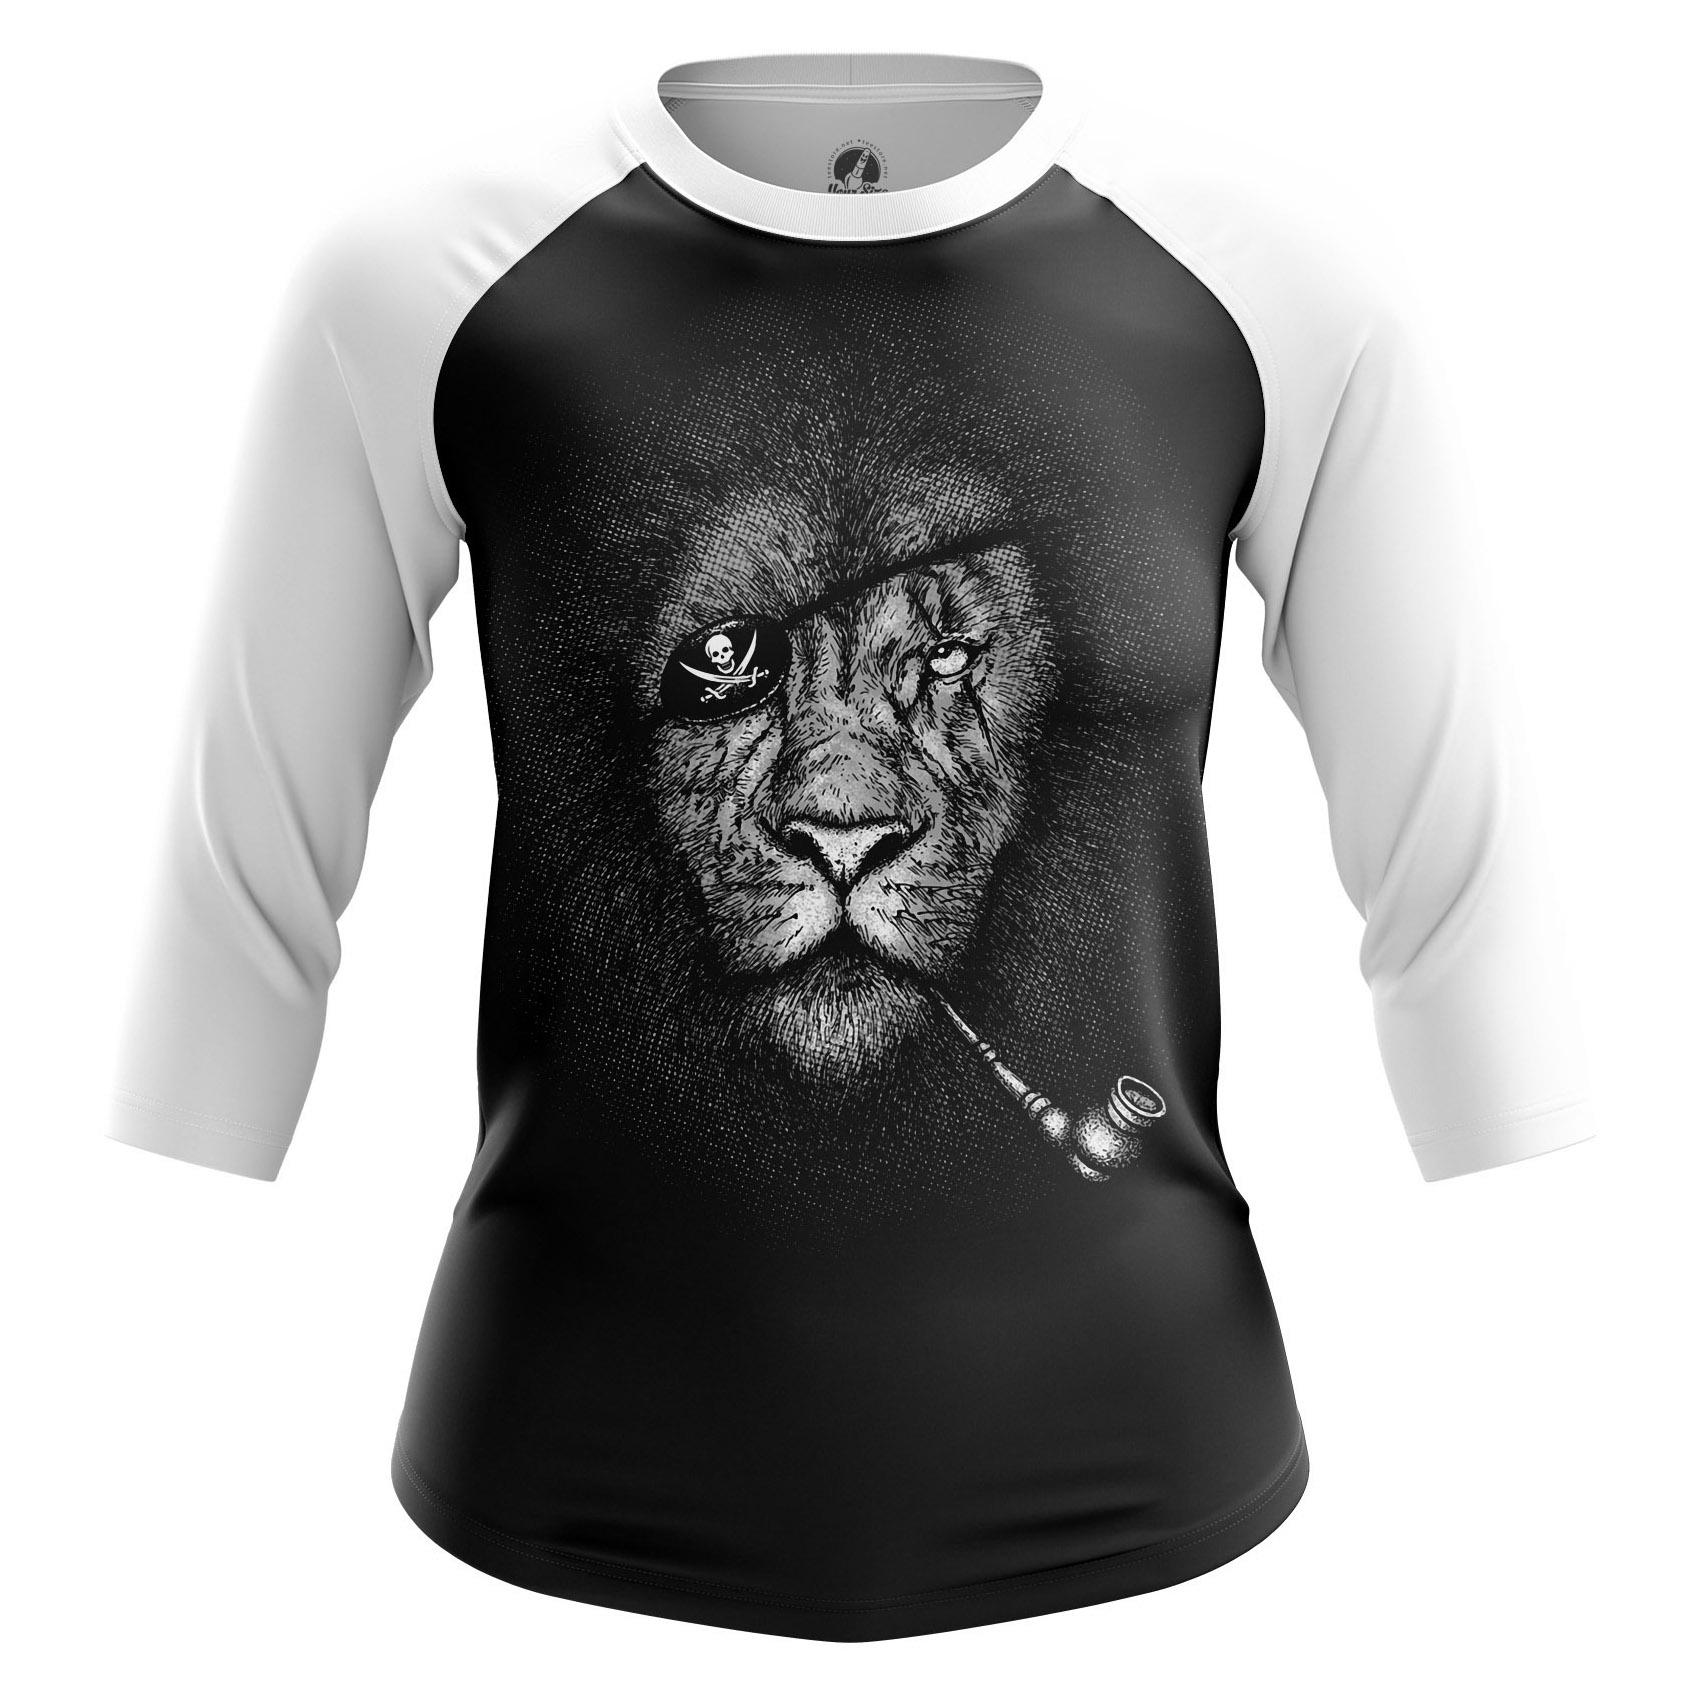 Merchandise Women'S Raglan King Pirate Animals Lions Pirates